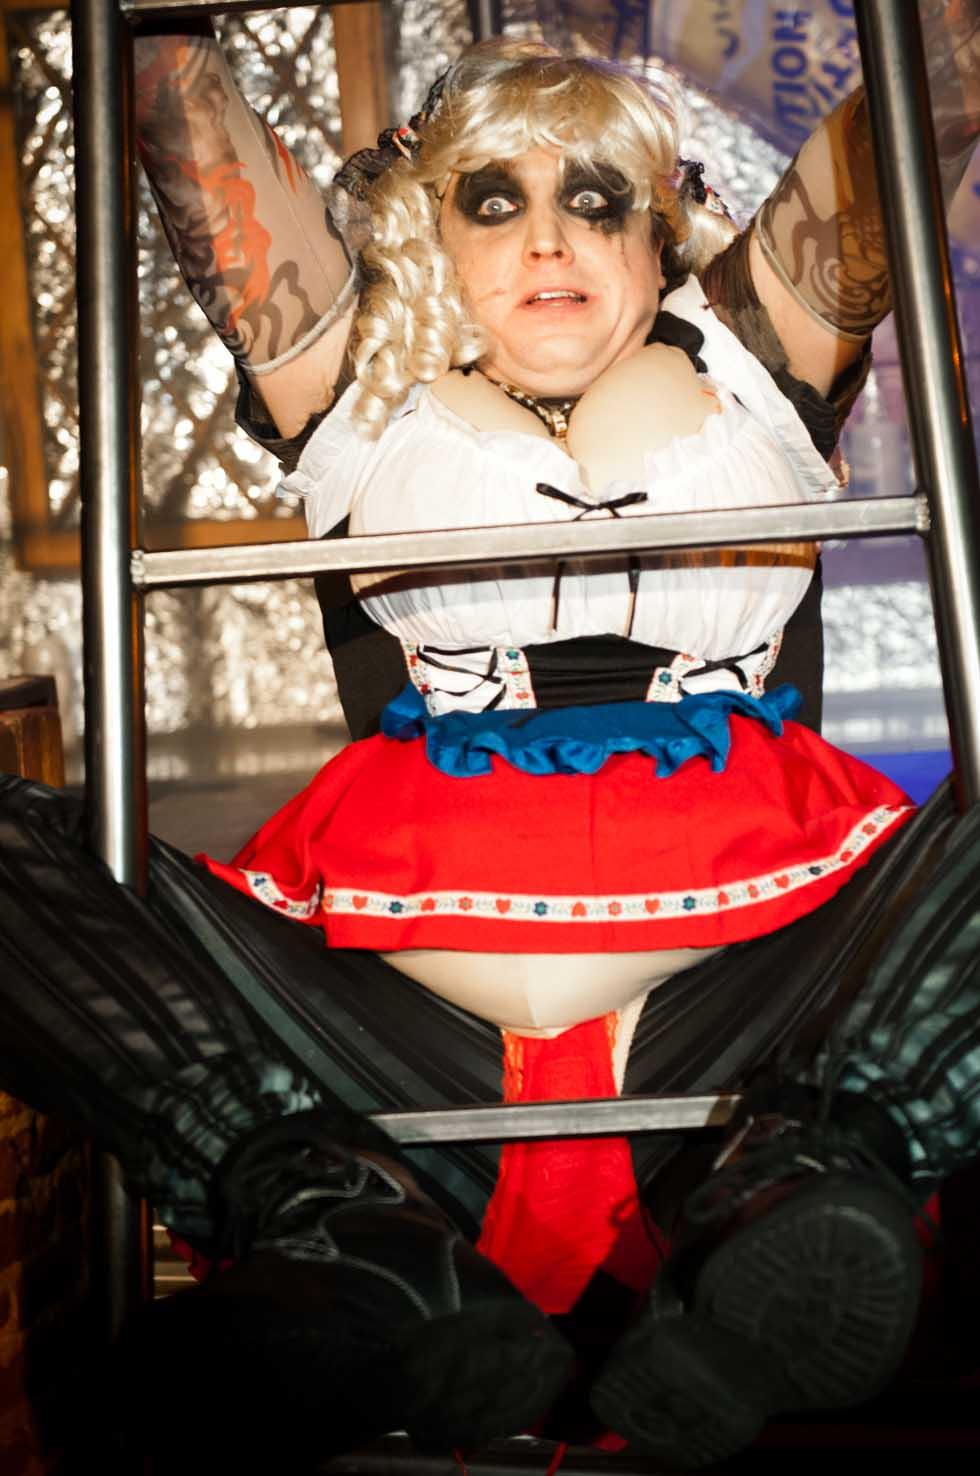 zum-schneider-nyc-2012-karneval-apocalyptika-4827.jpg